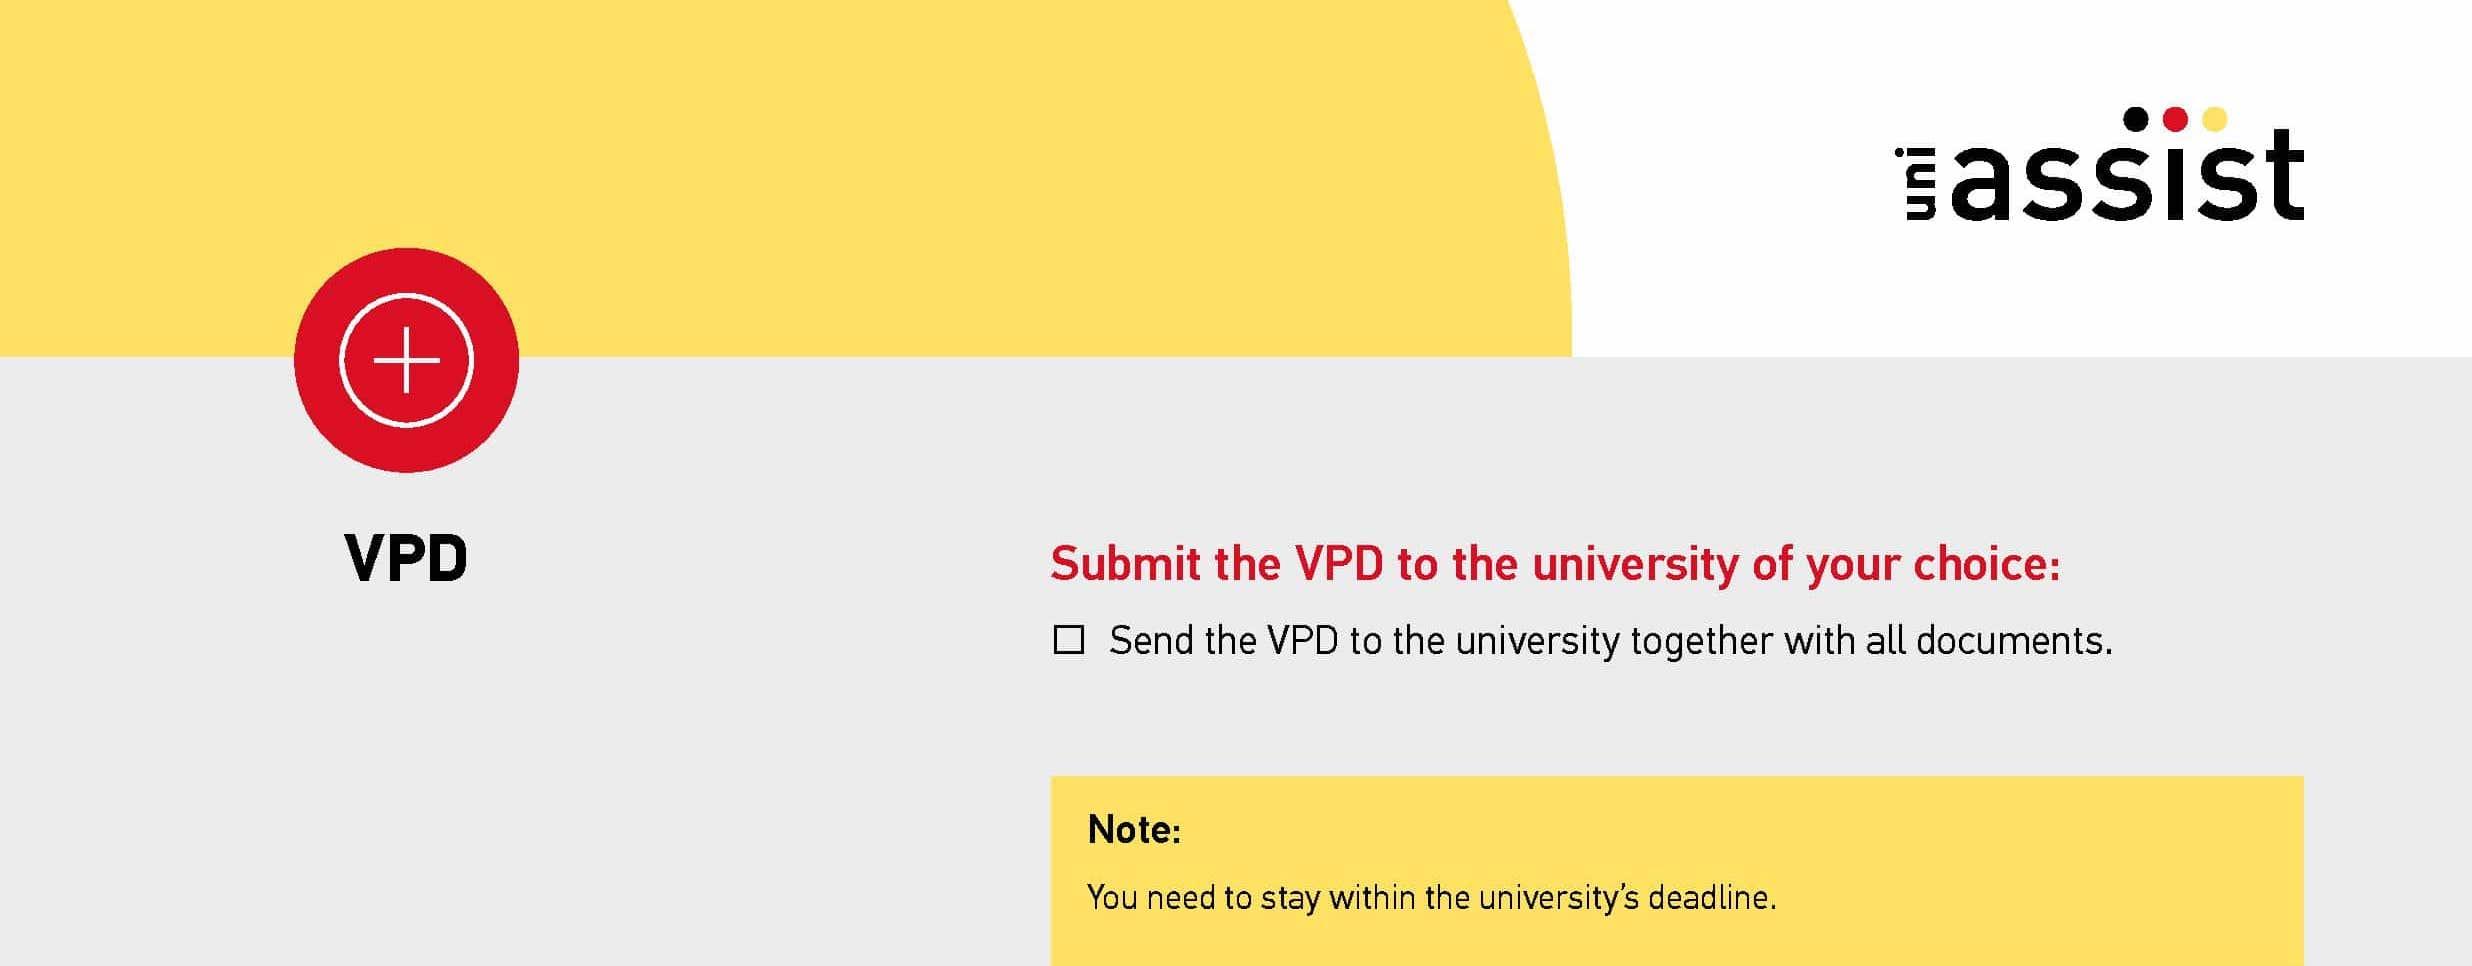 VORPRÜFUNGSDOKUMENTATION (VPD) by Uni Assist 3